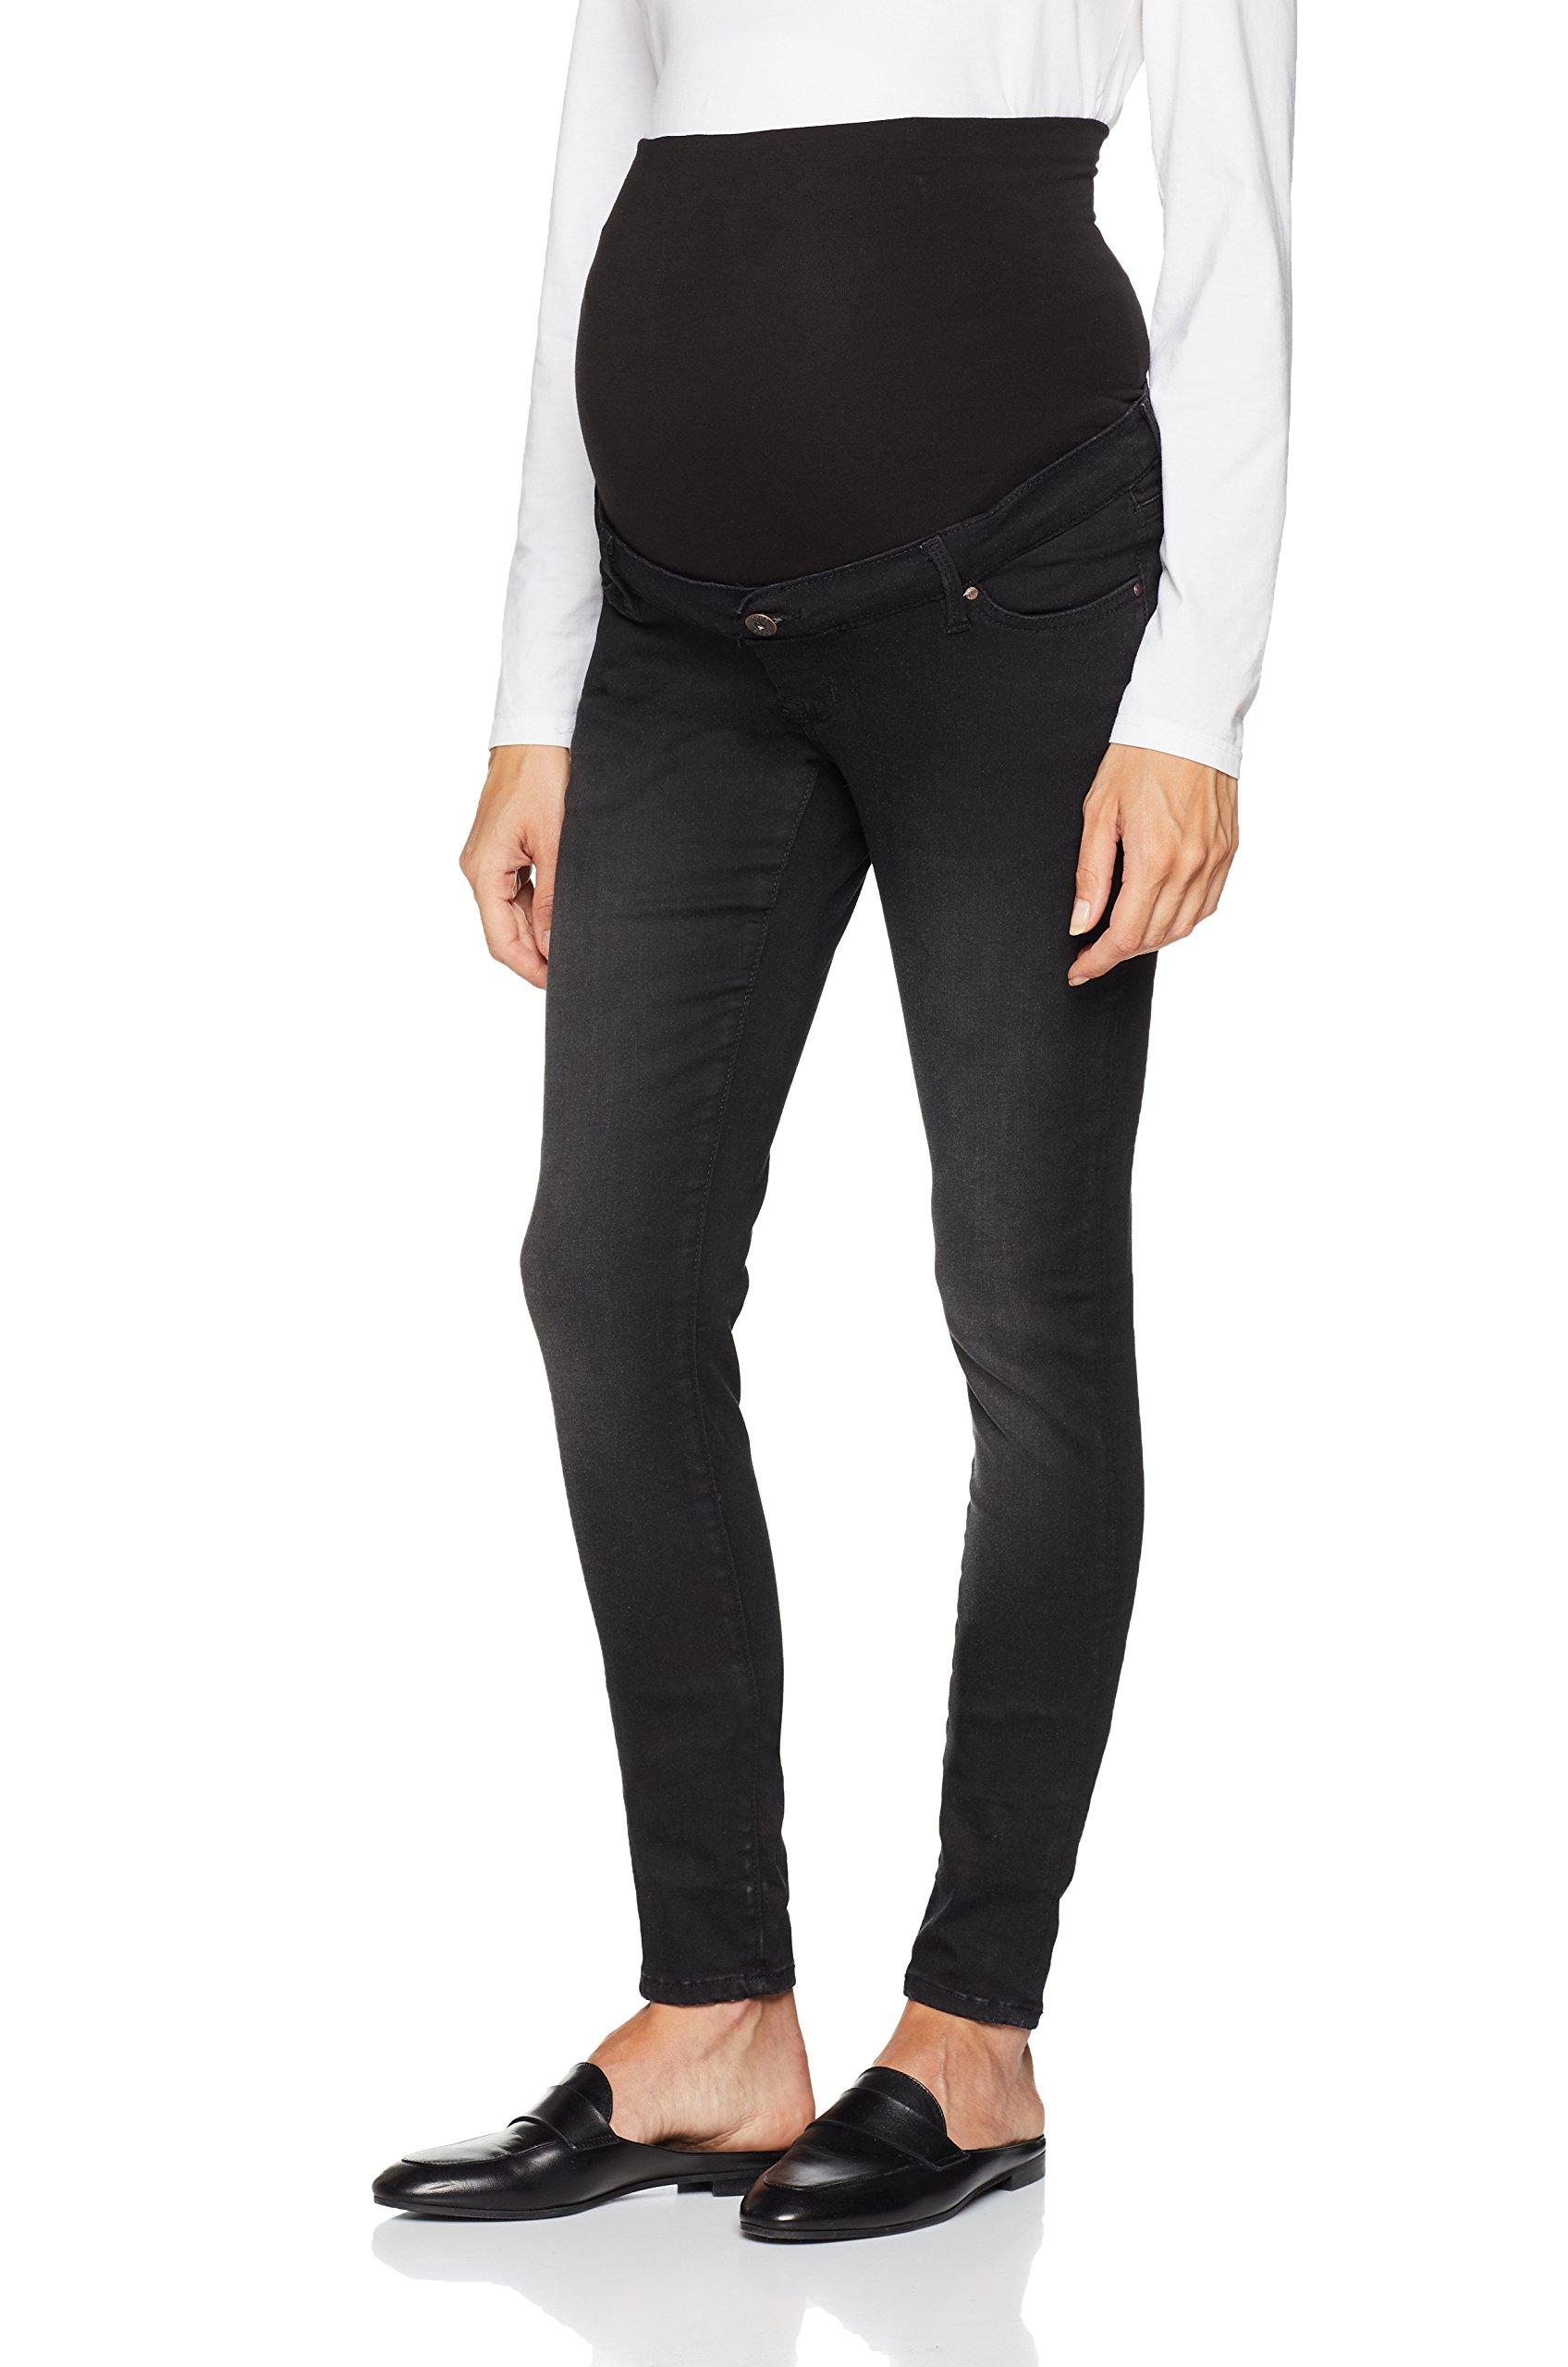 30l Everyday Black Skinny Femme Otb Jeans Avi C33731w Noppies MaternitéNoir X QCBWrxoEde